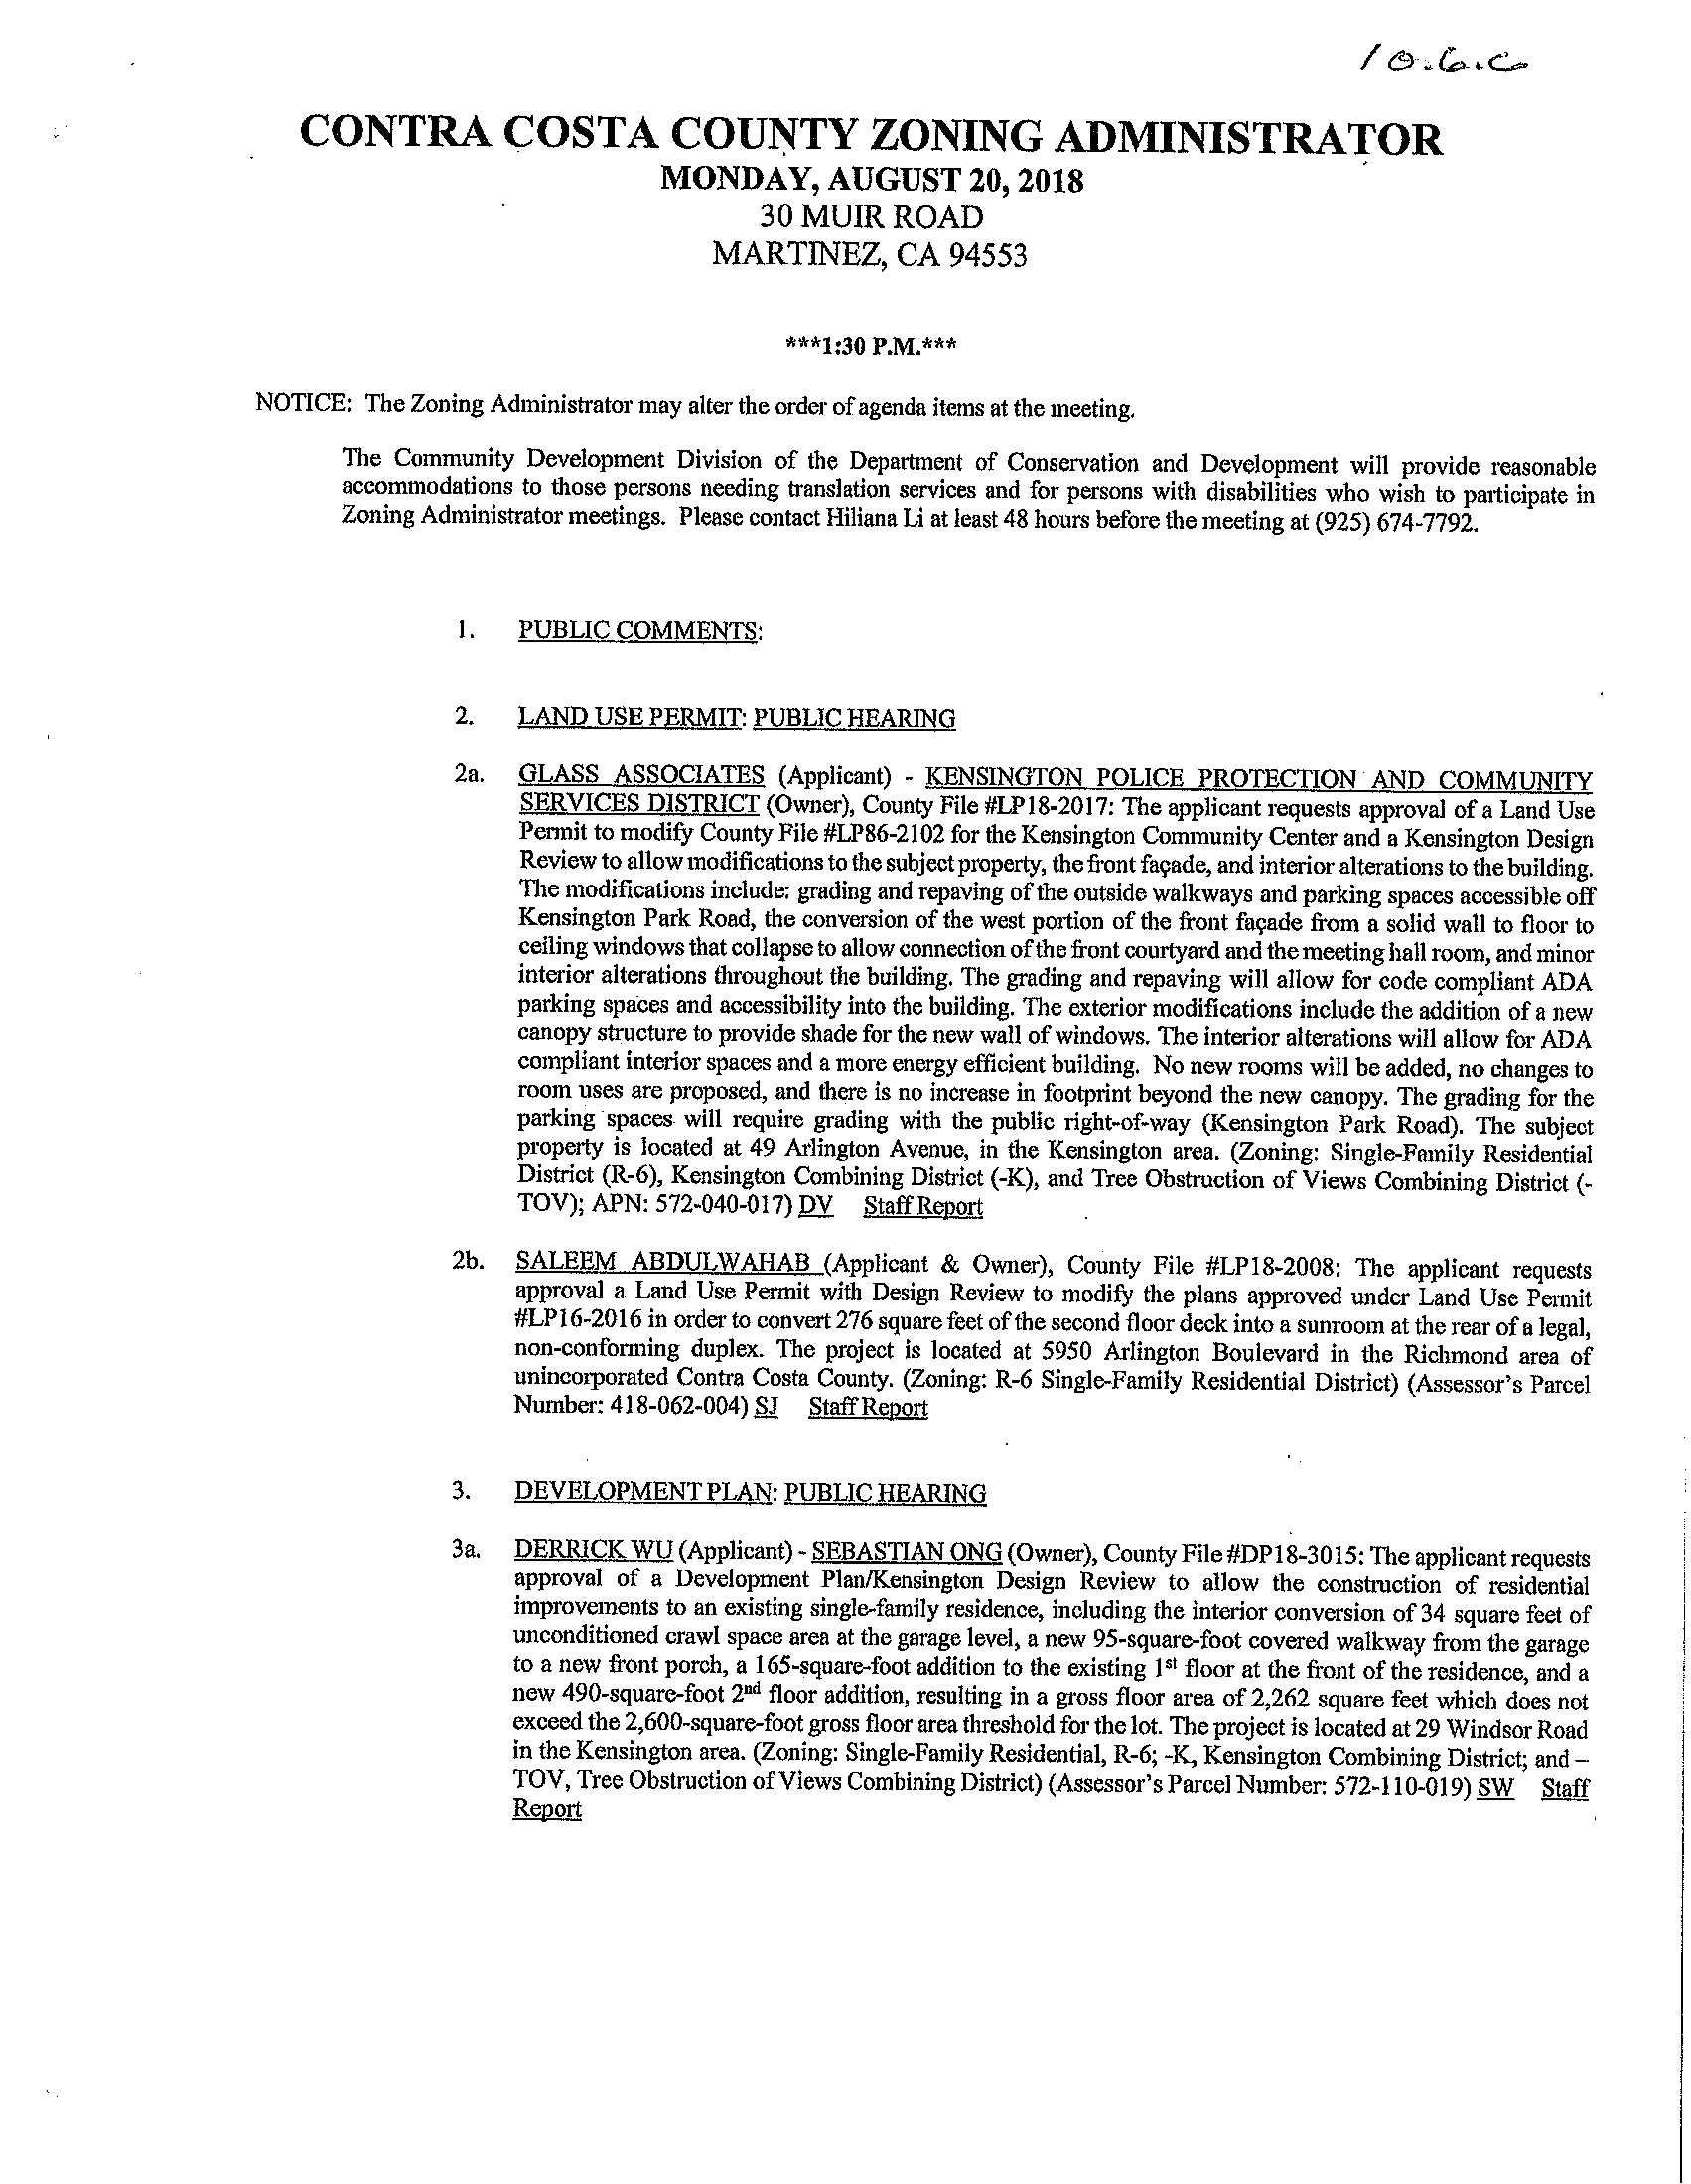 ESMAC Agenda 09.12.2018 (22 Pages)_21.jpg